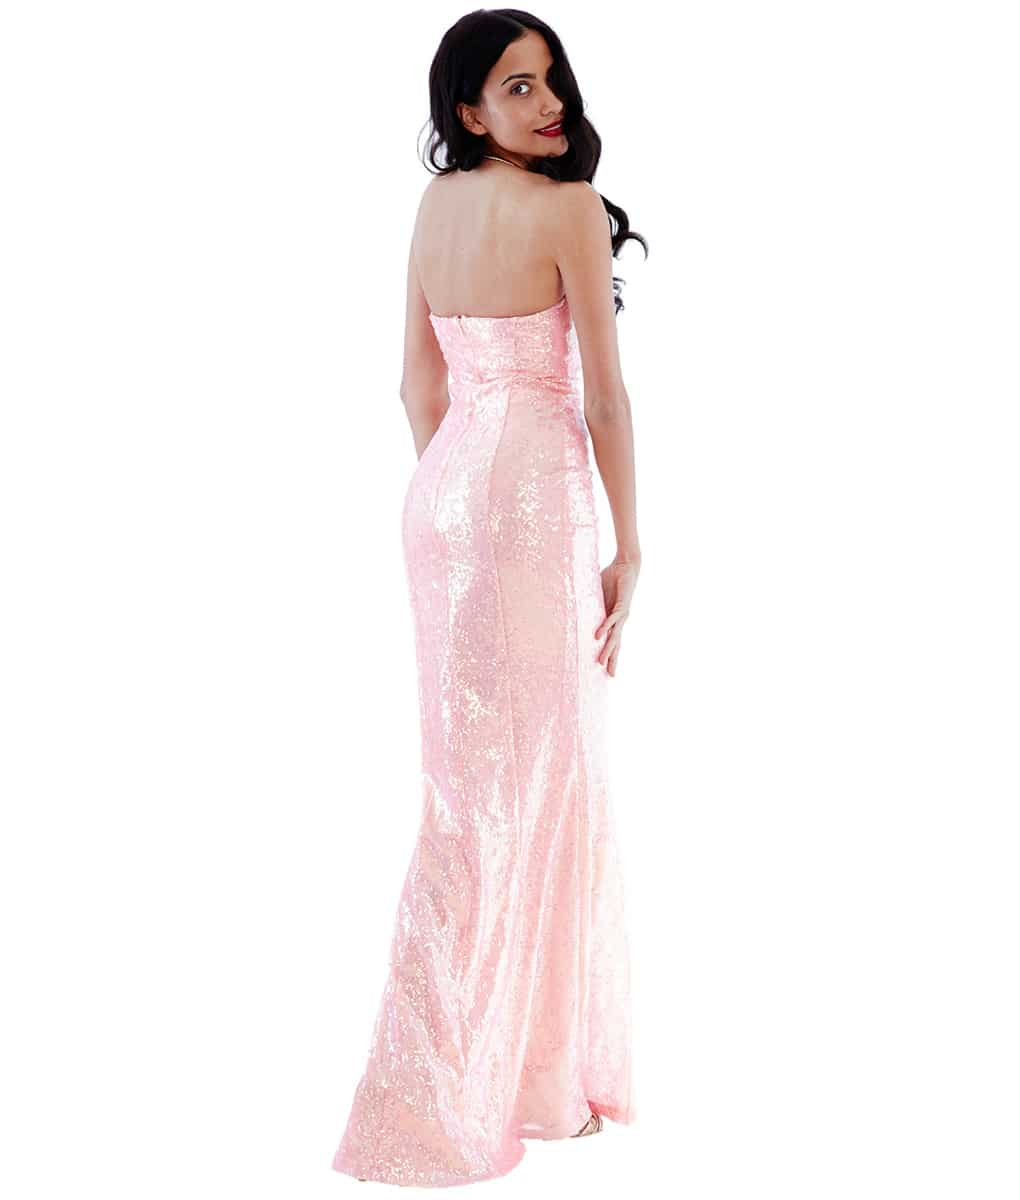 Alila-Peach-pink-sequin-strapless-debs-dress-city-goddess